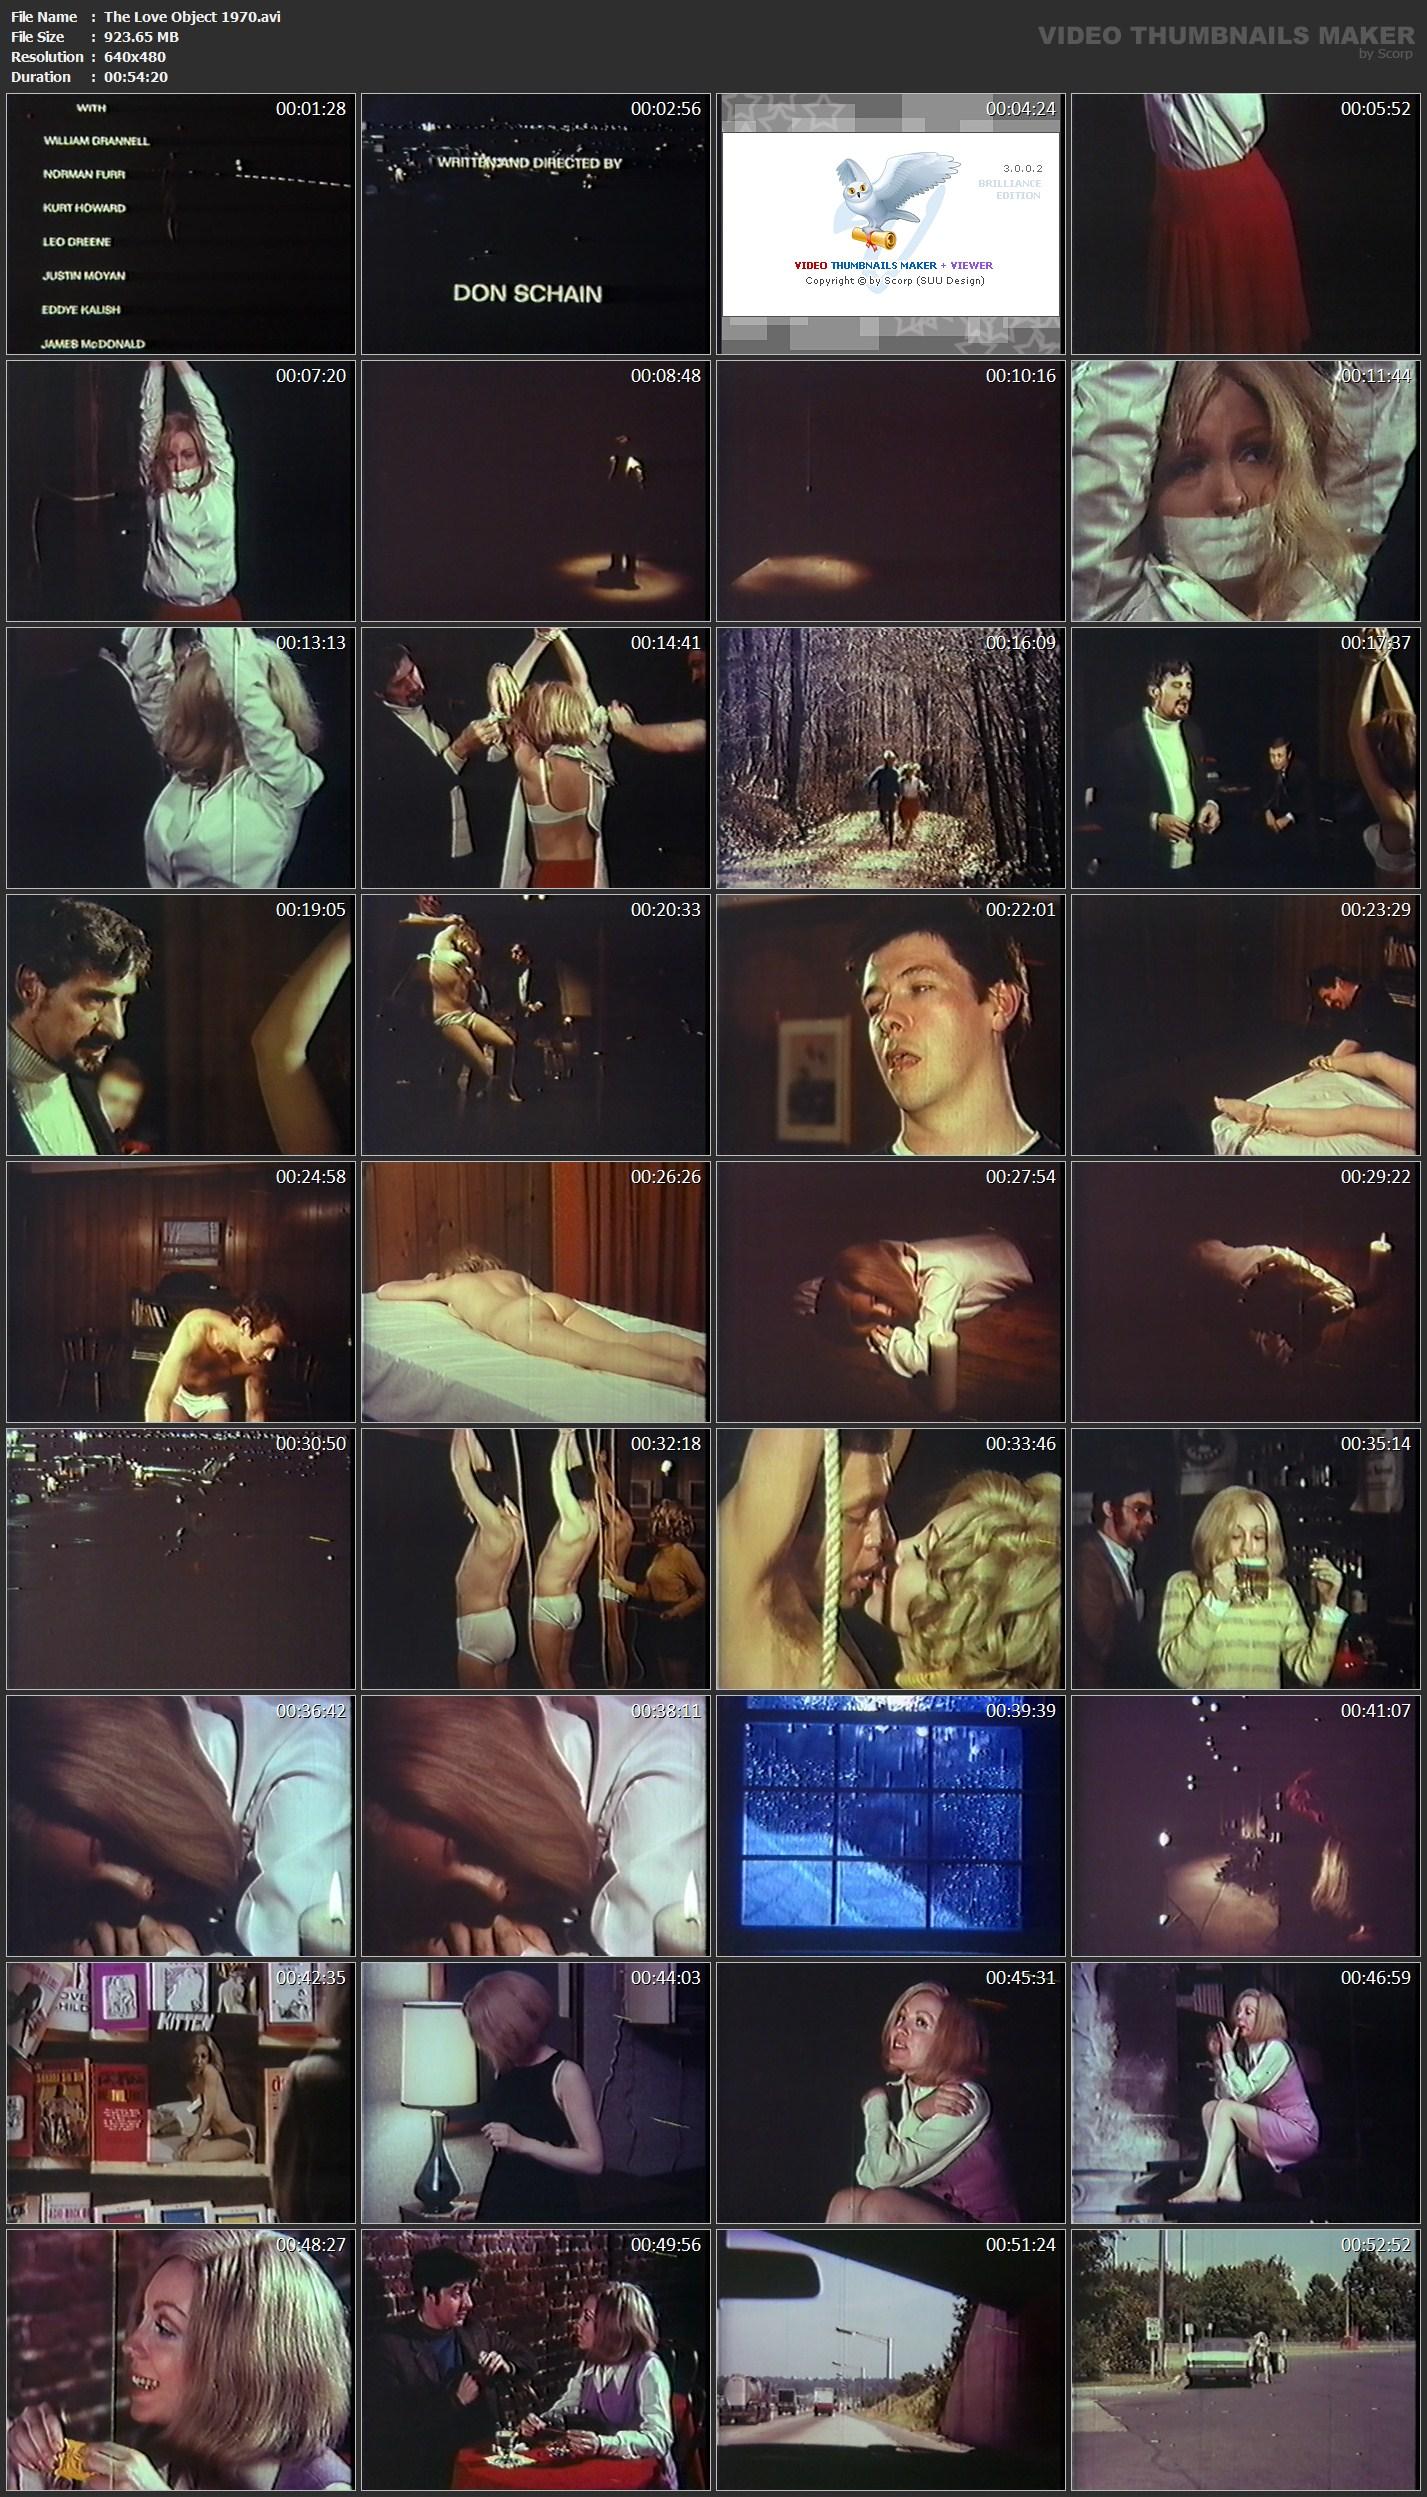 hardcore sex videos avi